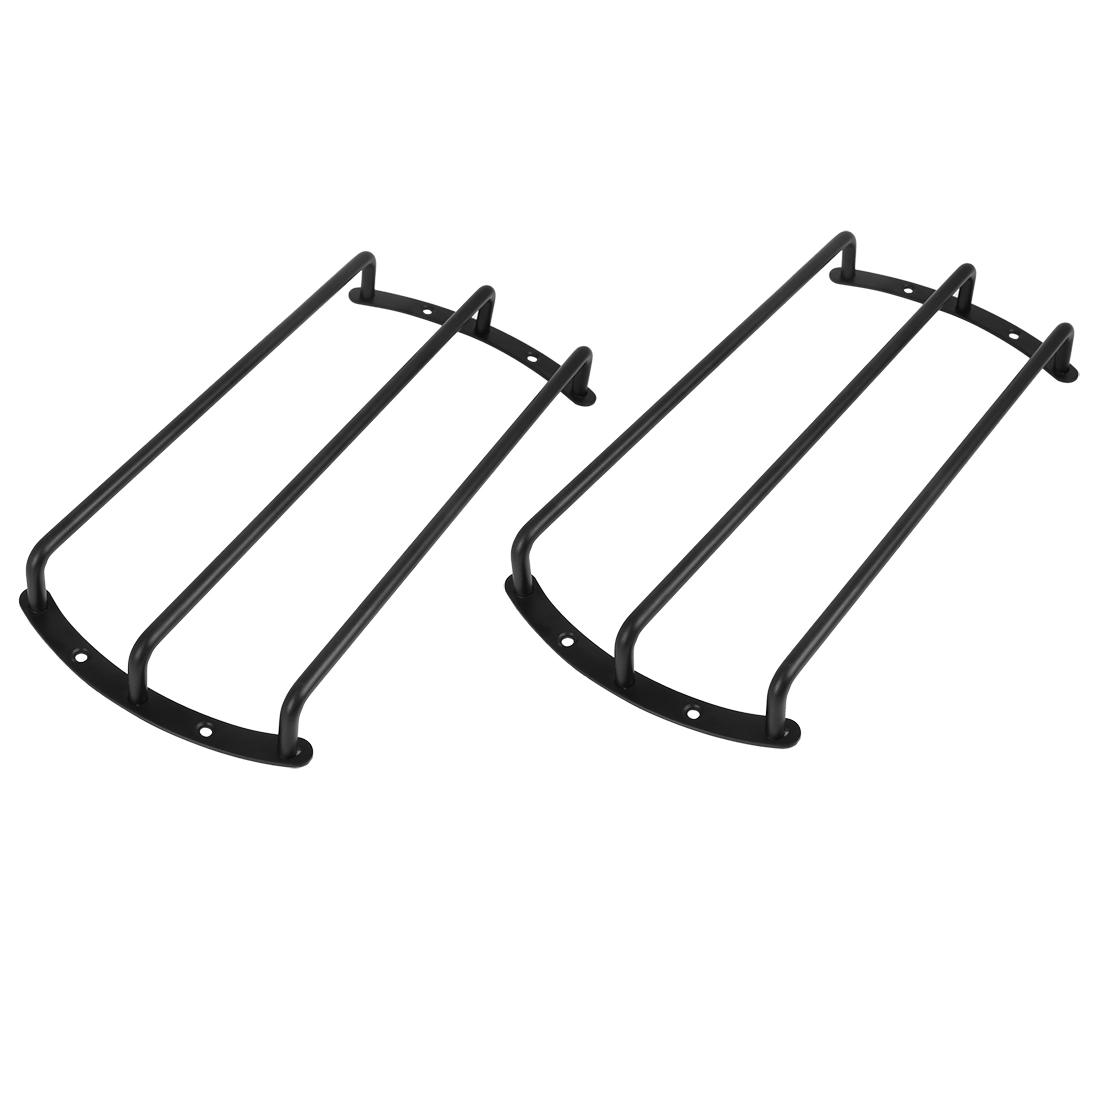 2pcs 10 Inch Black Metal Car Bar Grille Speaker Subwoofer Grill Cover Protector